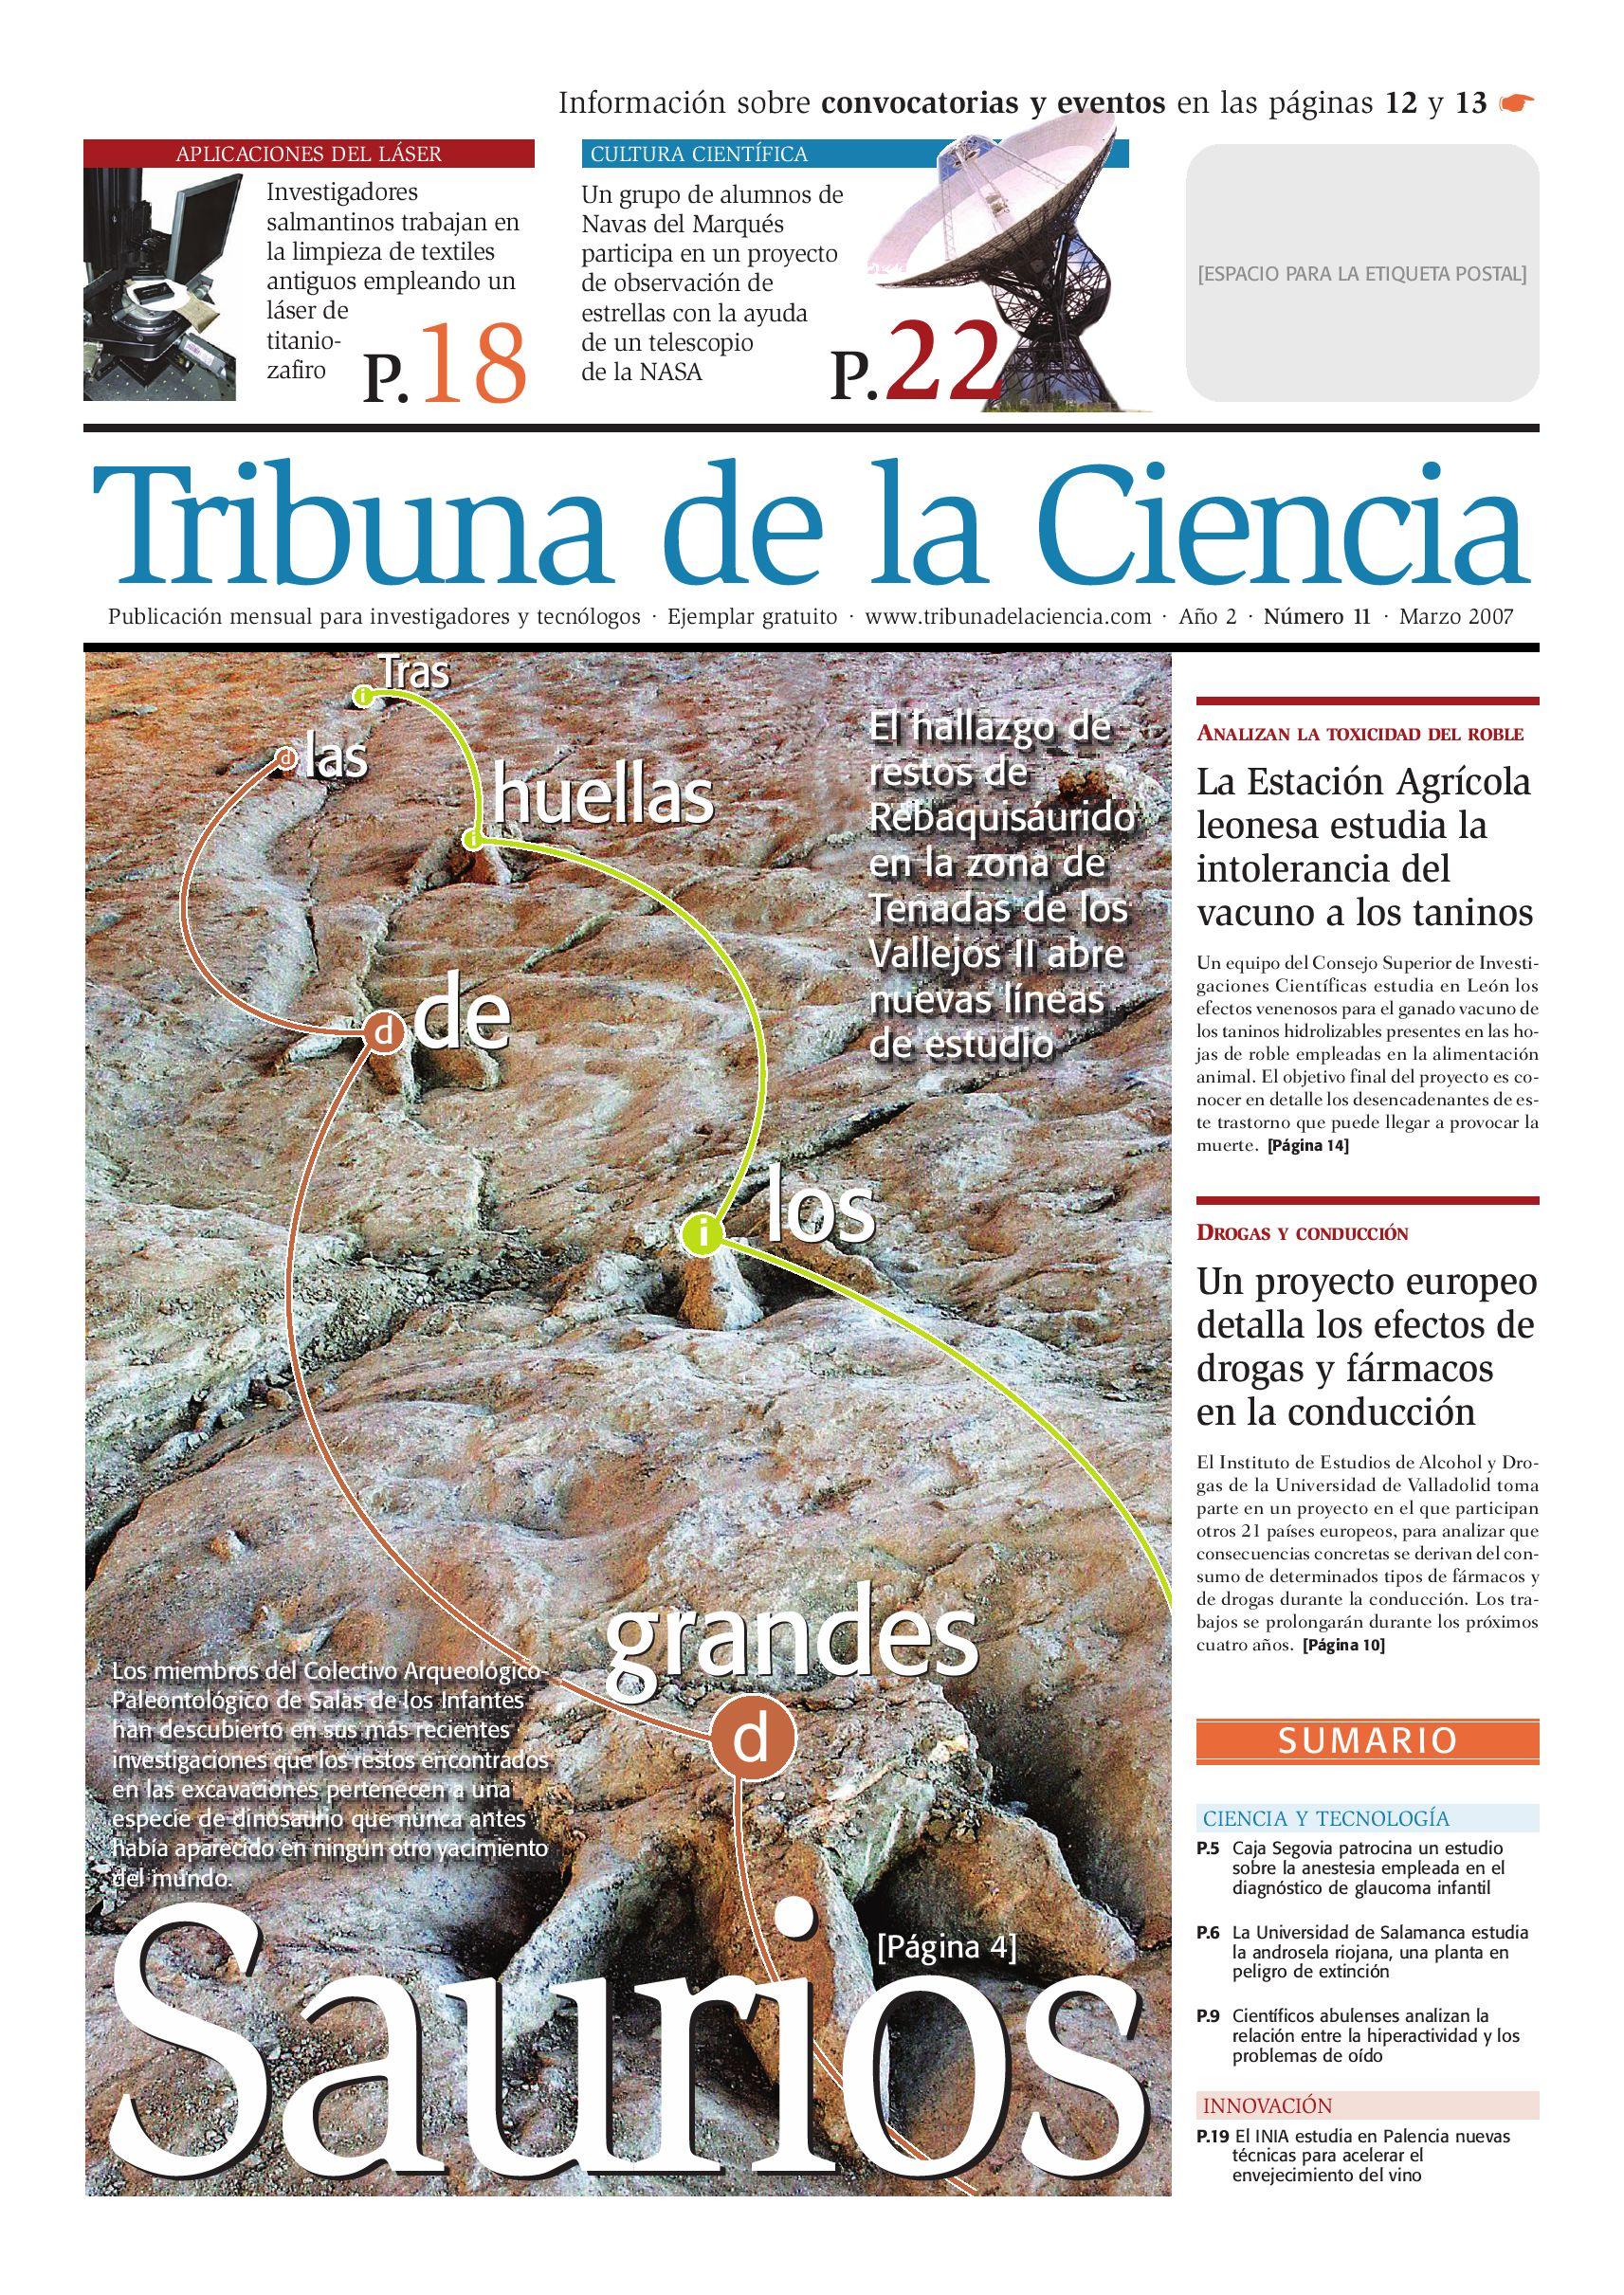 Tribuna de la Ciencia #11 by Agencia DiCYT - issuu